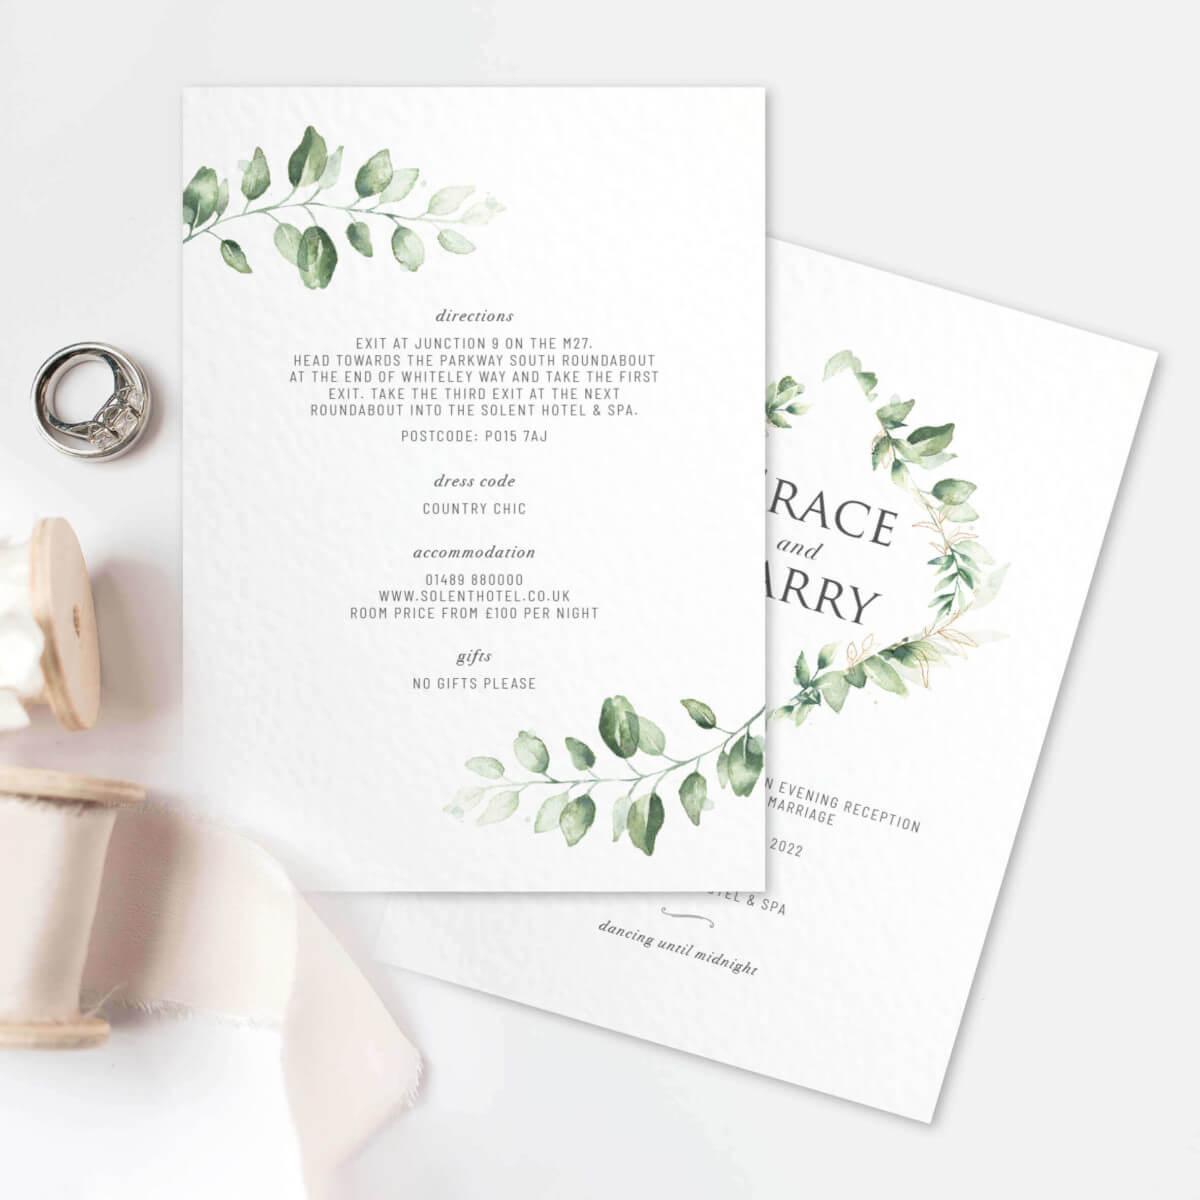 Green Foliage Invitation text on reverse